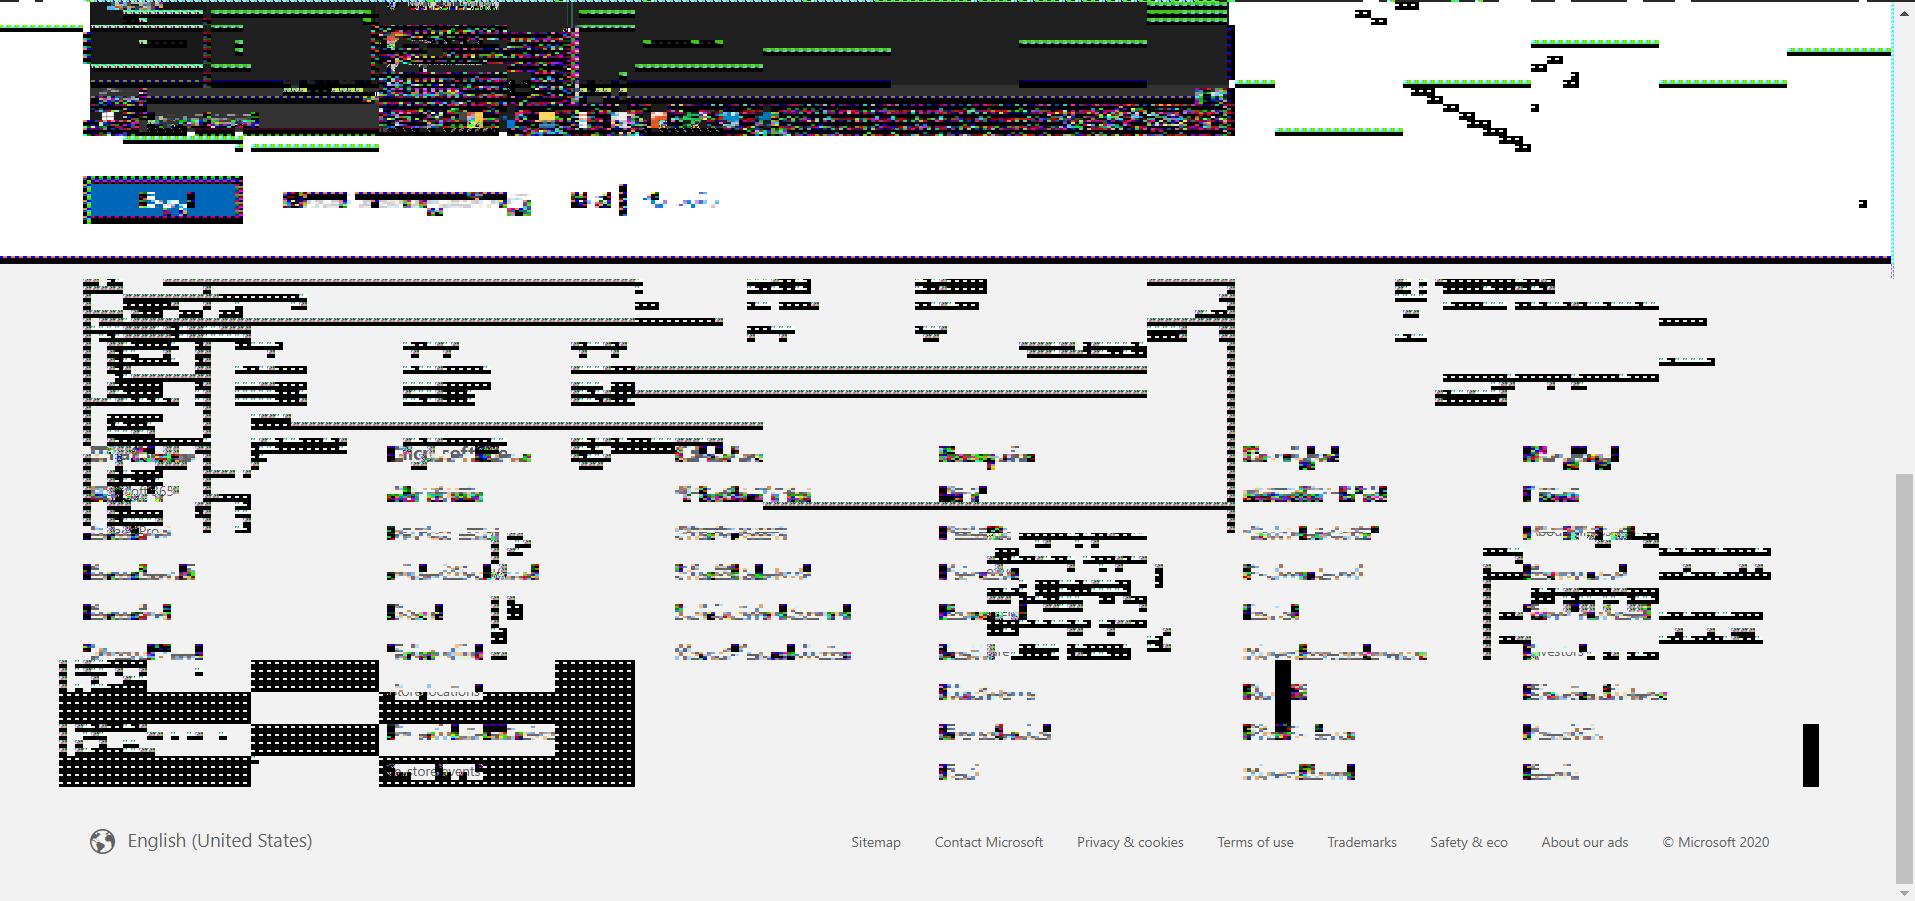 UI Glitches all around the system 55c3a733-ae60-4de9-aebe-56340d809e46?upload=true.png